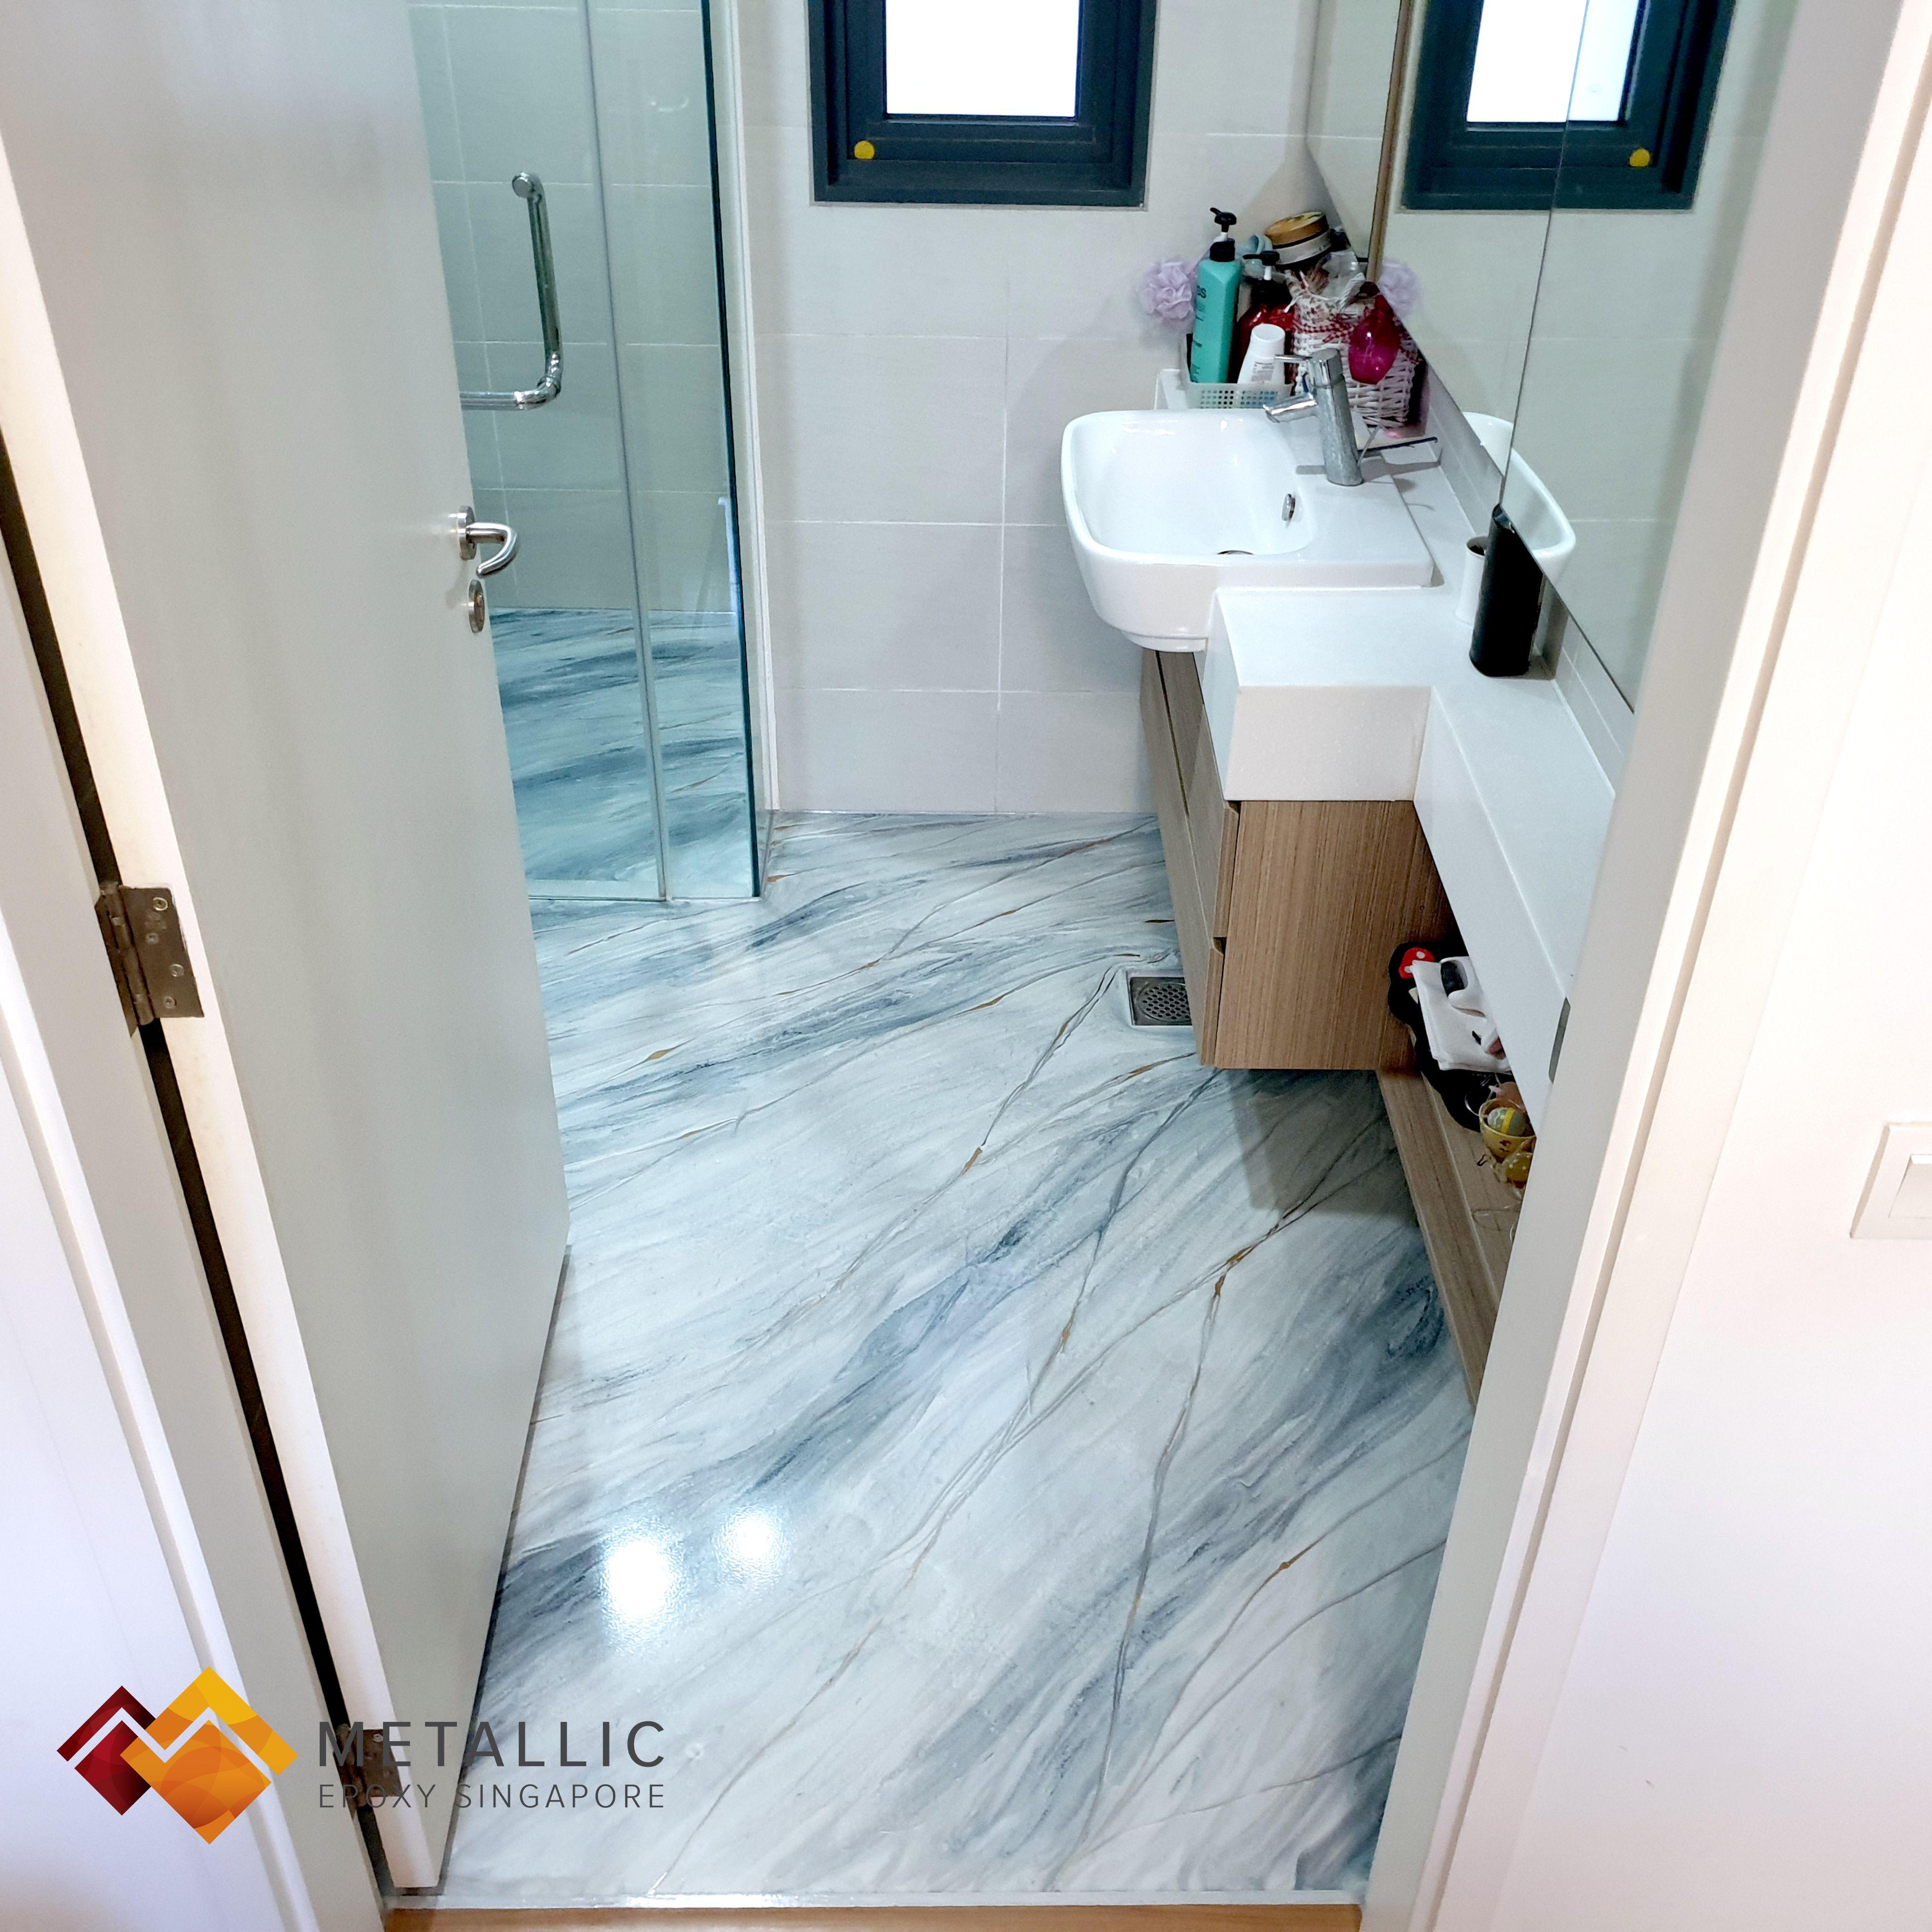 Metallic Epoxy Silver Gold Highlights On Light Grey Marble Bathroom Floor In 2020 Grey Marble Bathroom Grey Marble Bathroom Floor Marble Bathroom Floor